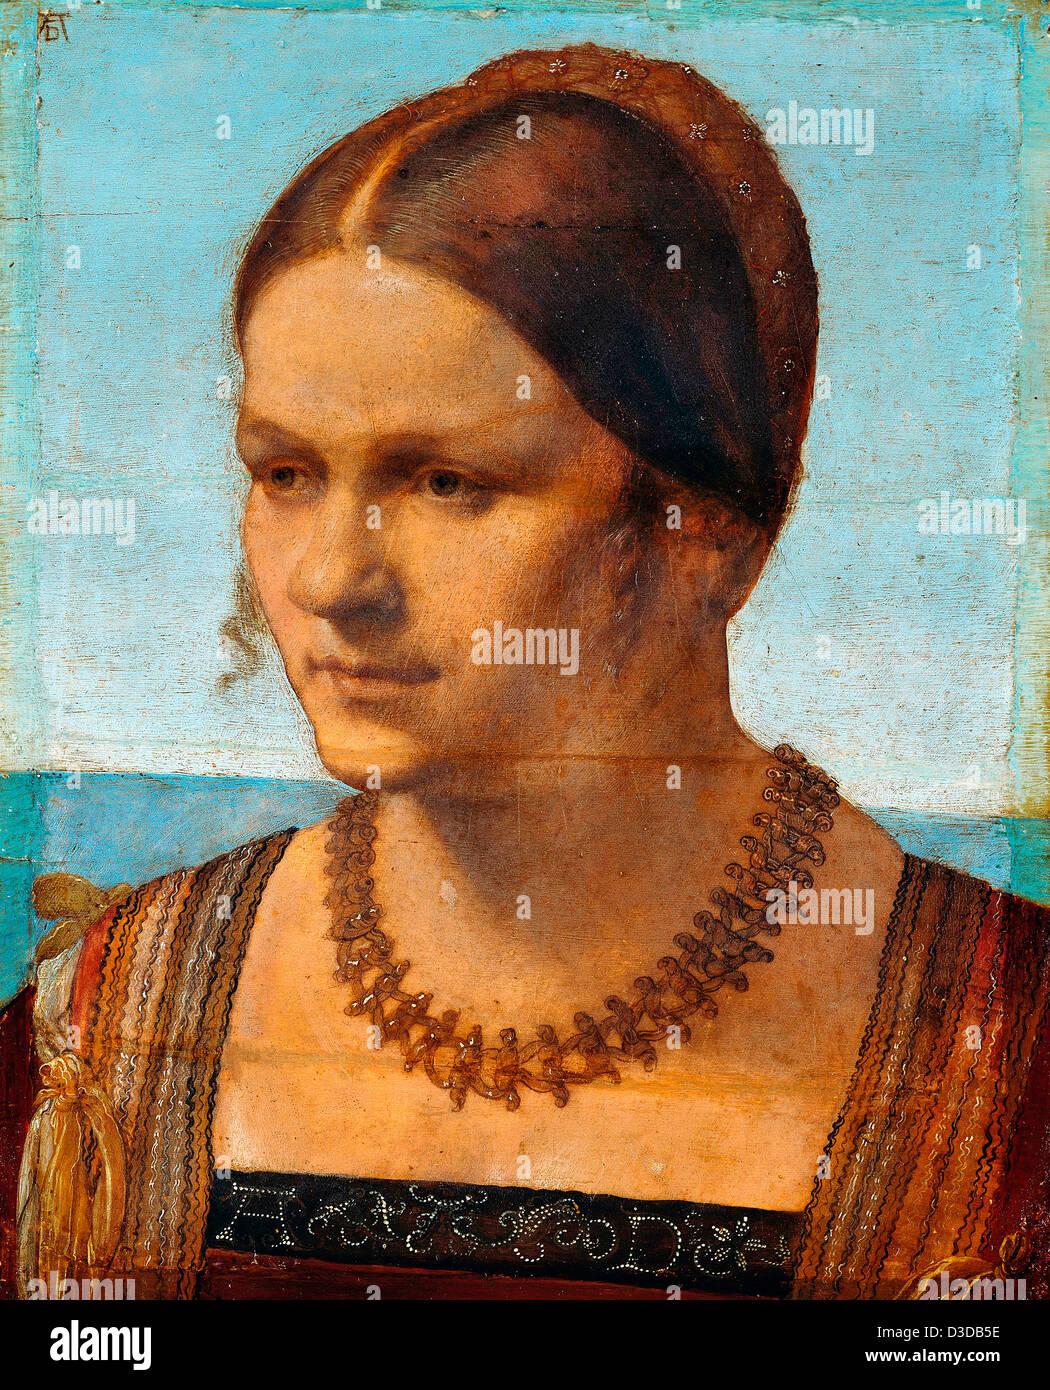 Albrecht Durer, Portrait of a Venetian Woman 1507 Oil on panel. Berlin State Museums - Stock Image